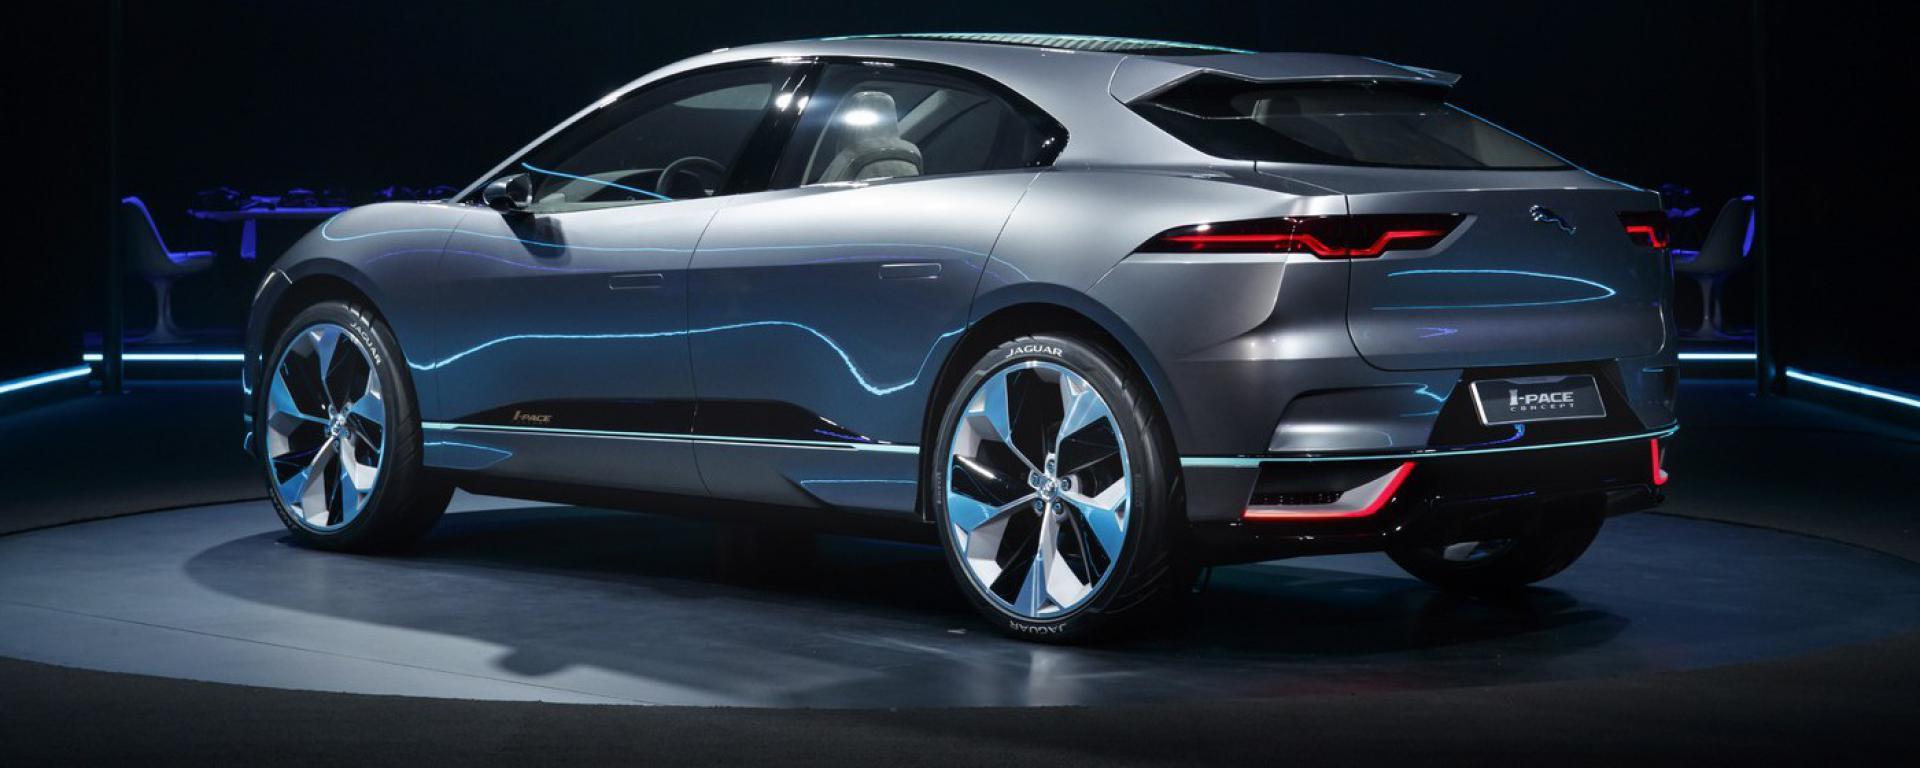 To πρώτο της ηλεκτροκίνητο αυτοκίνητο παρουσίασε η Jaguar